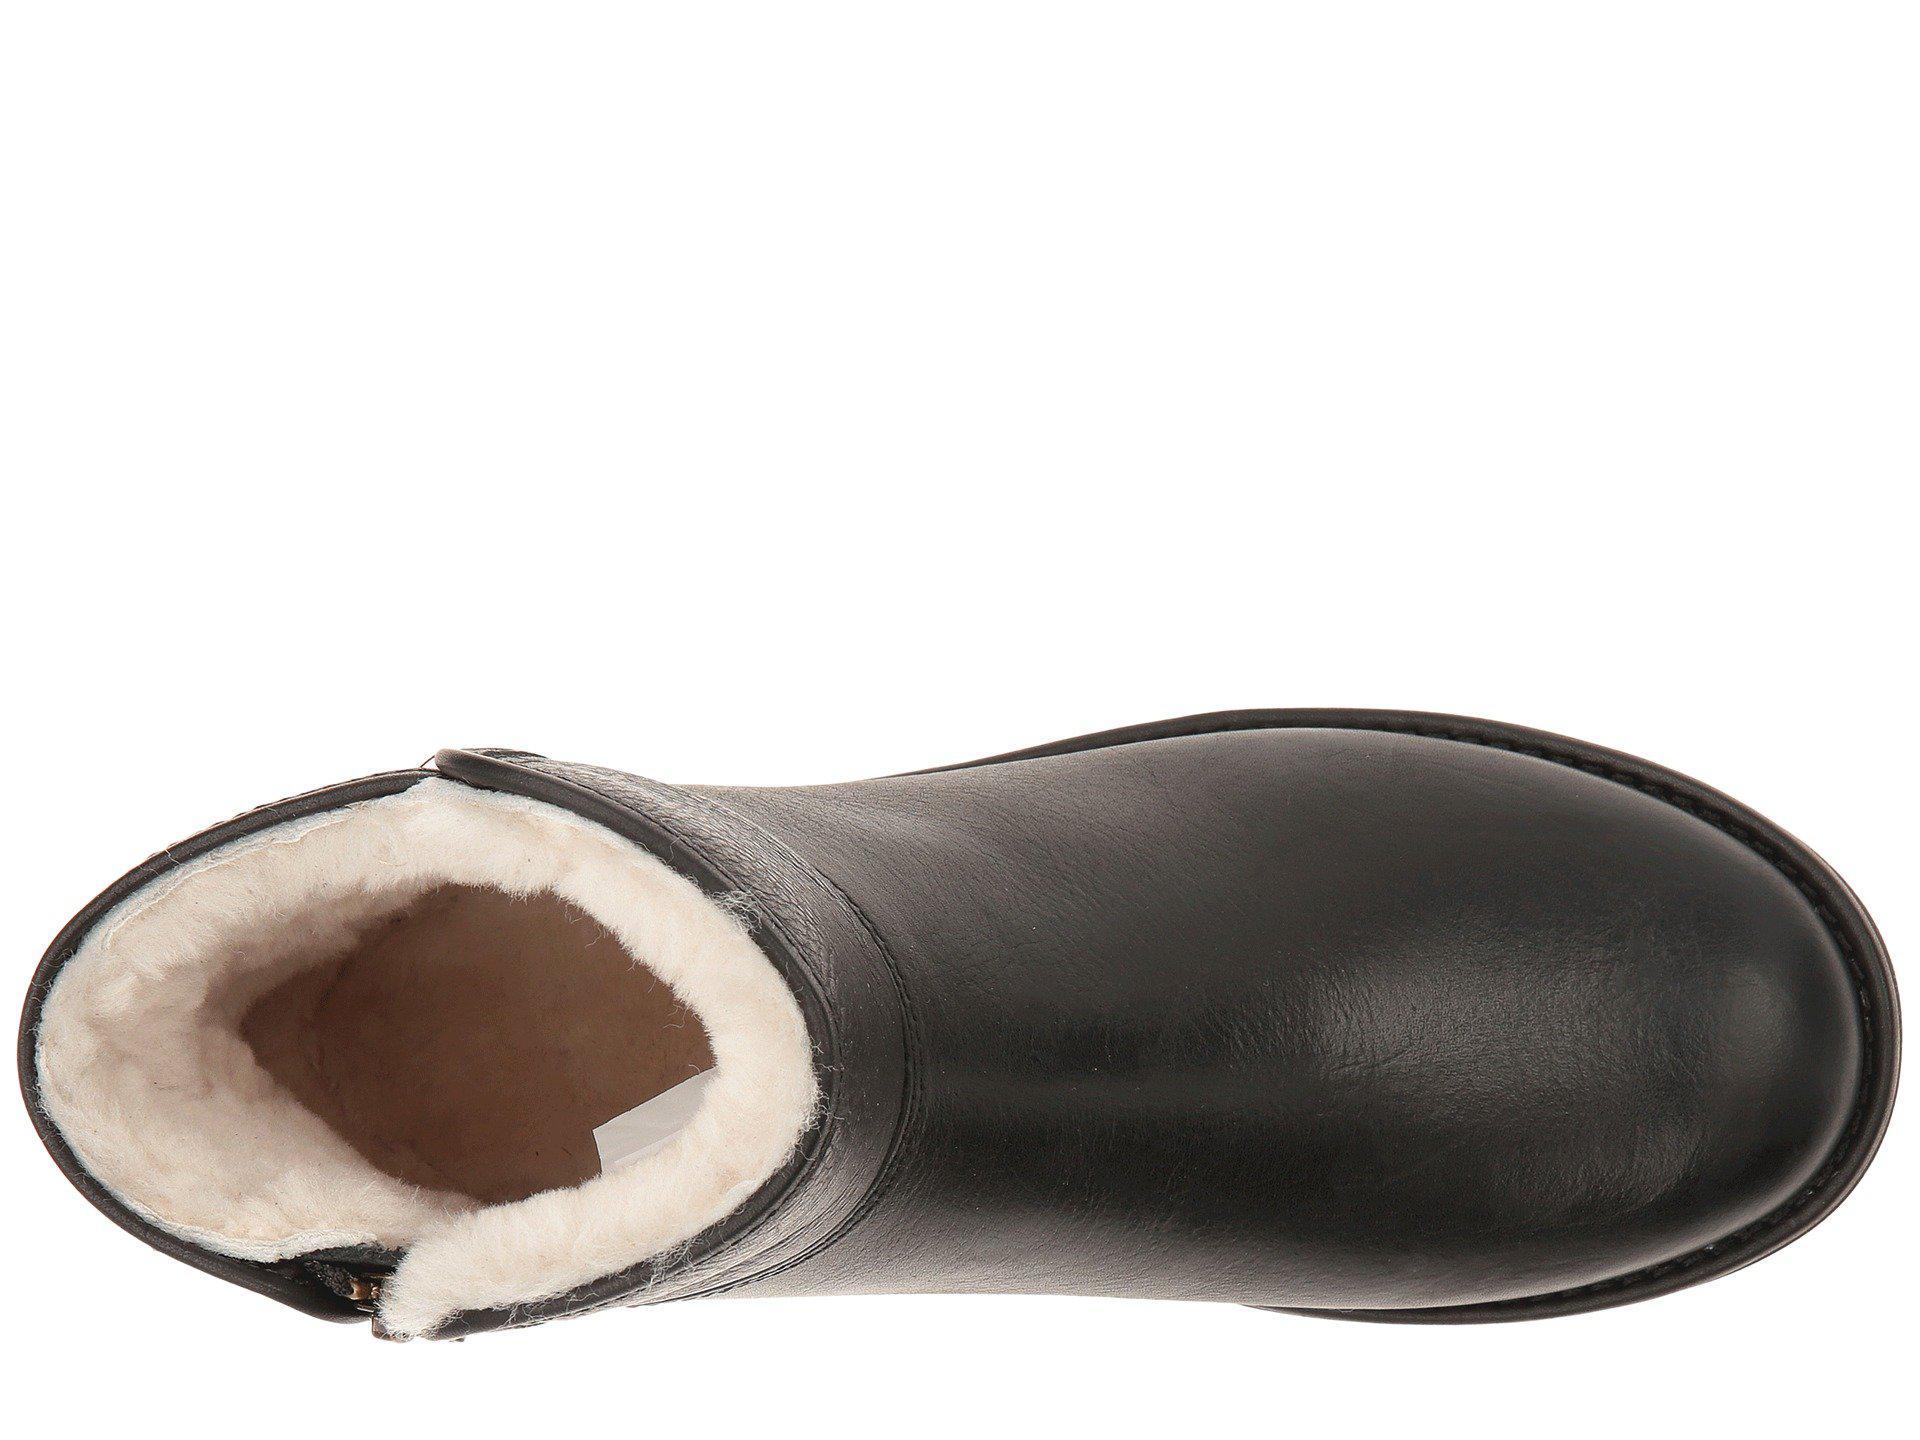 Lyst - UGG Abree Mini Leather Boots Nero in Black fad146fee